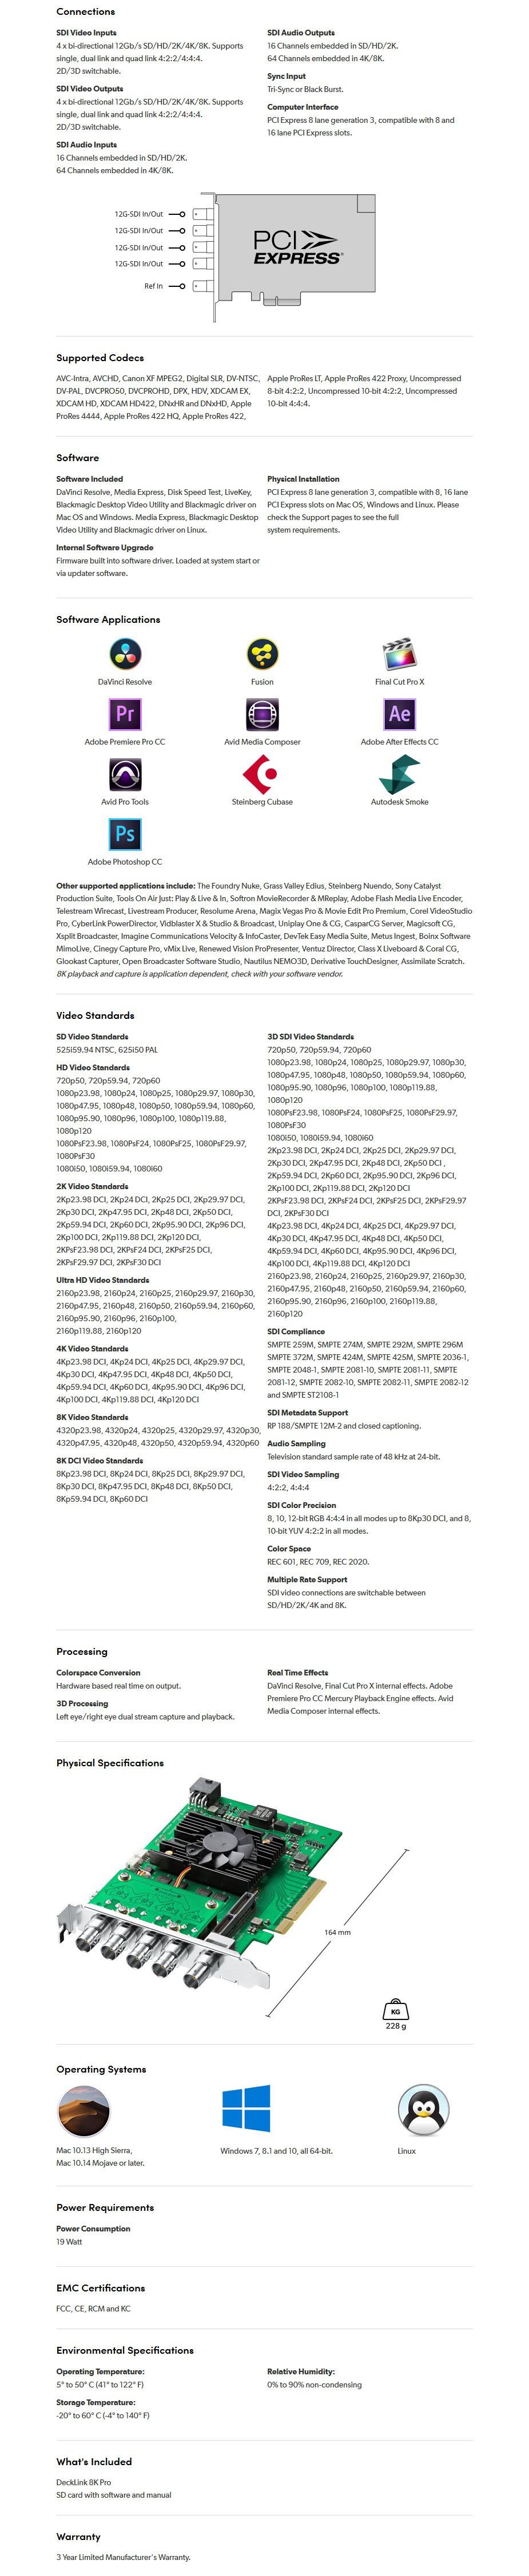 Blackmagic Design DeckLink 8K Pro Capture Card - Overview 2